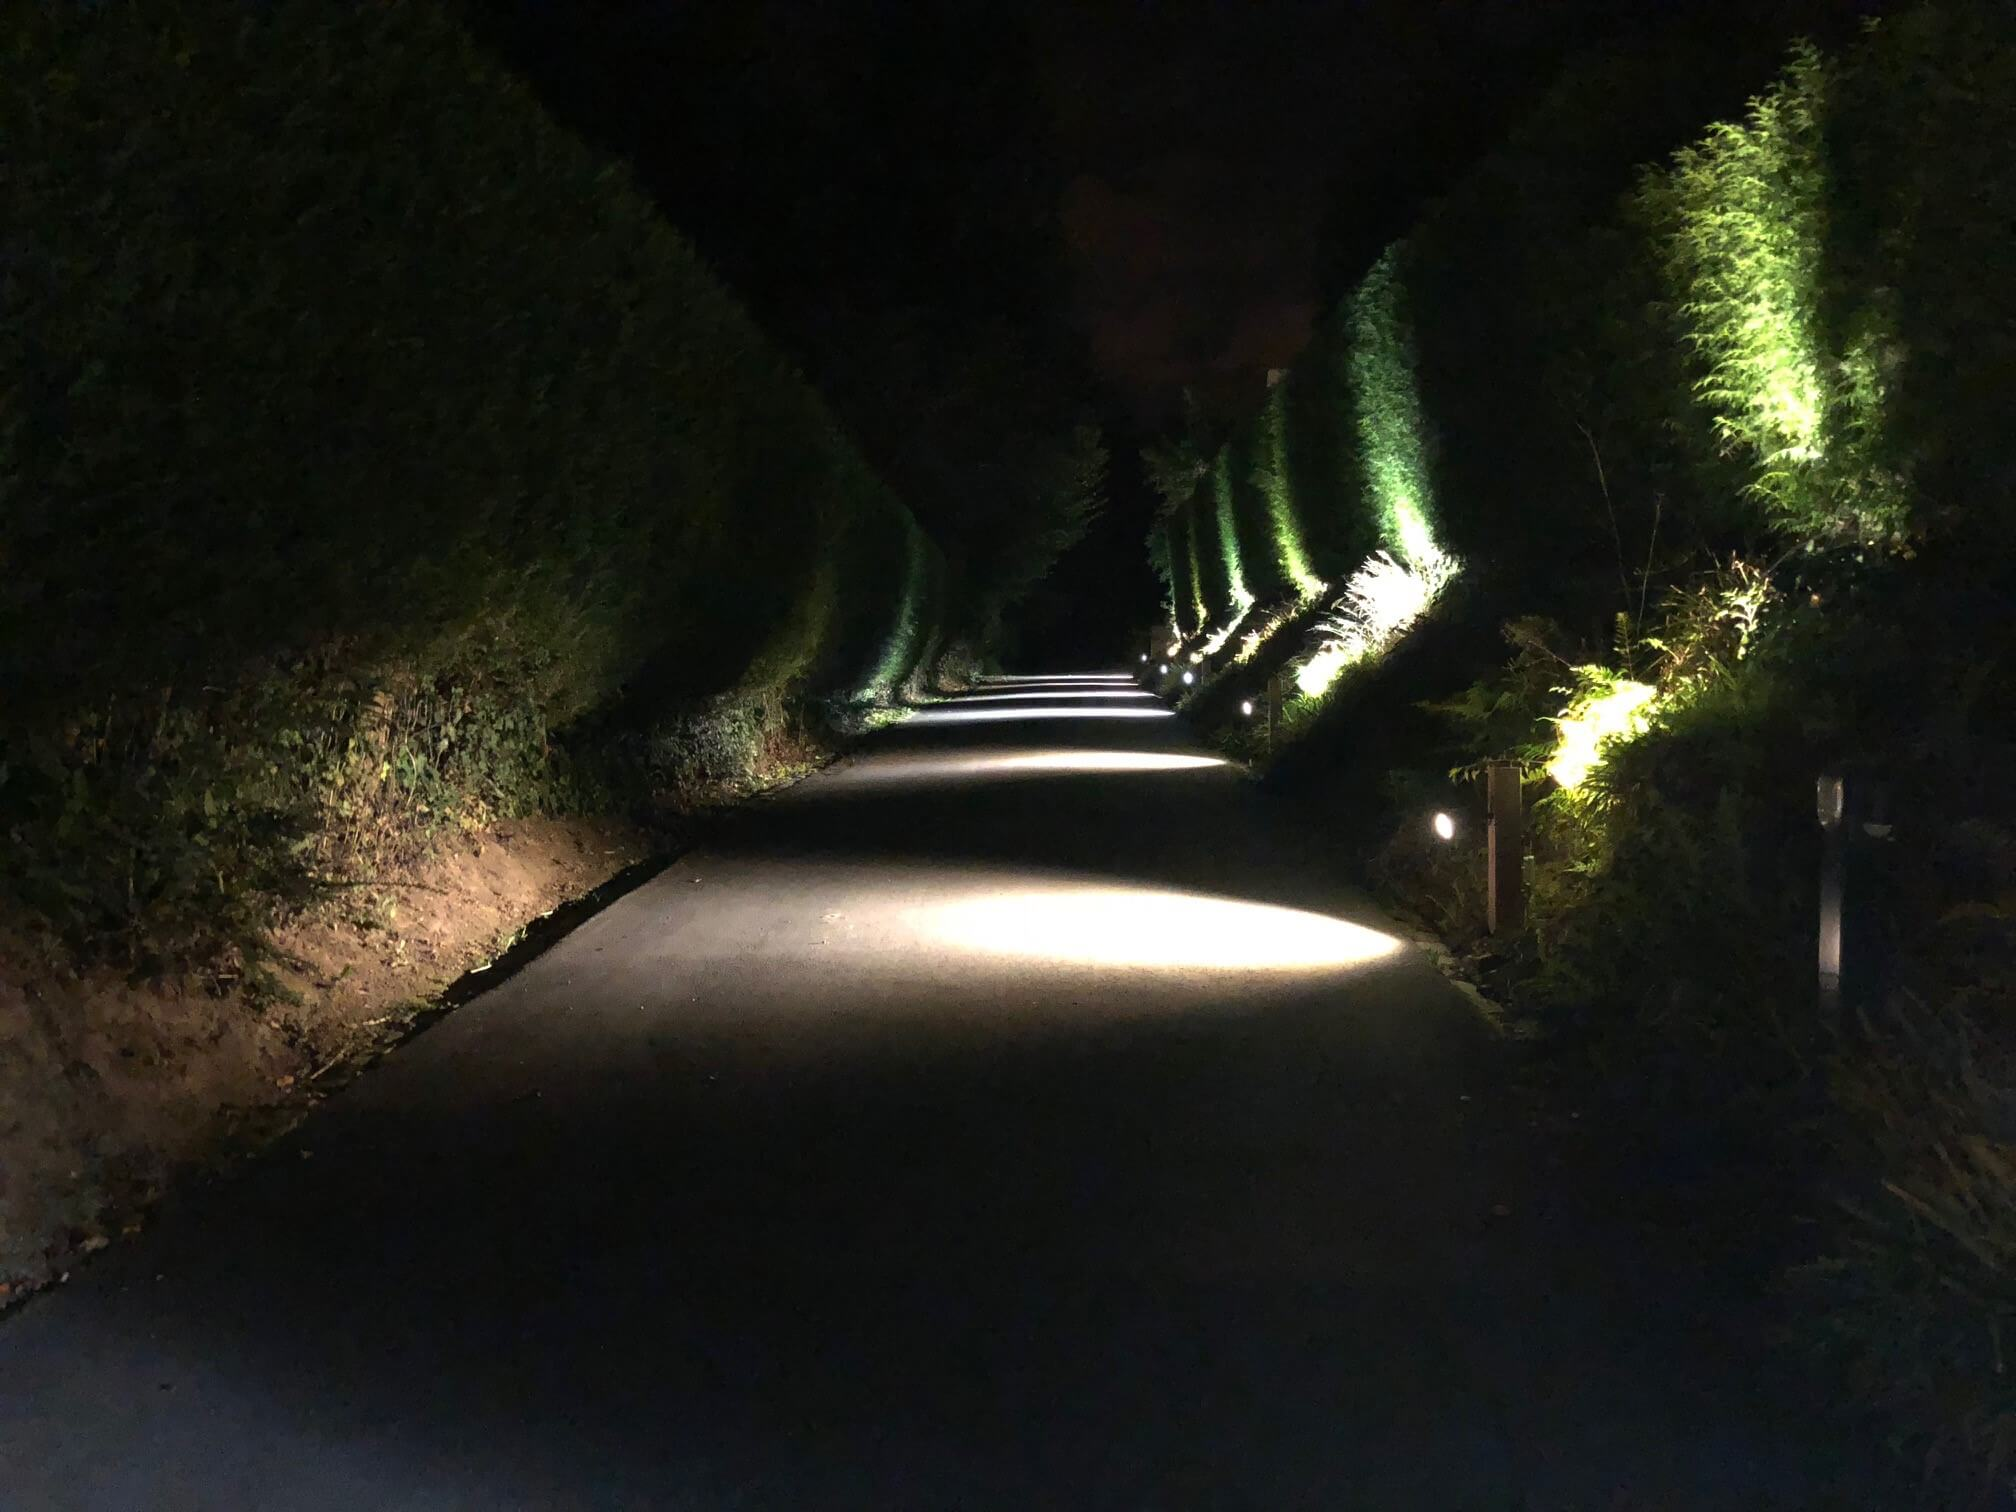 night-electricite-galerie-electricite-vanhoyesprl